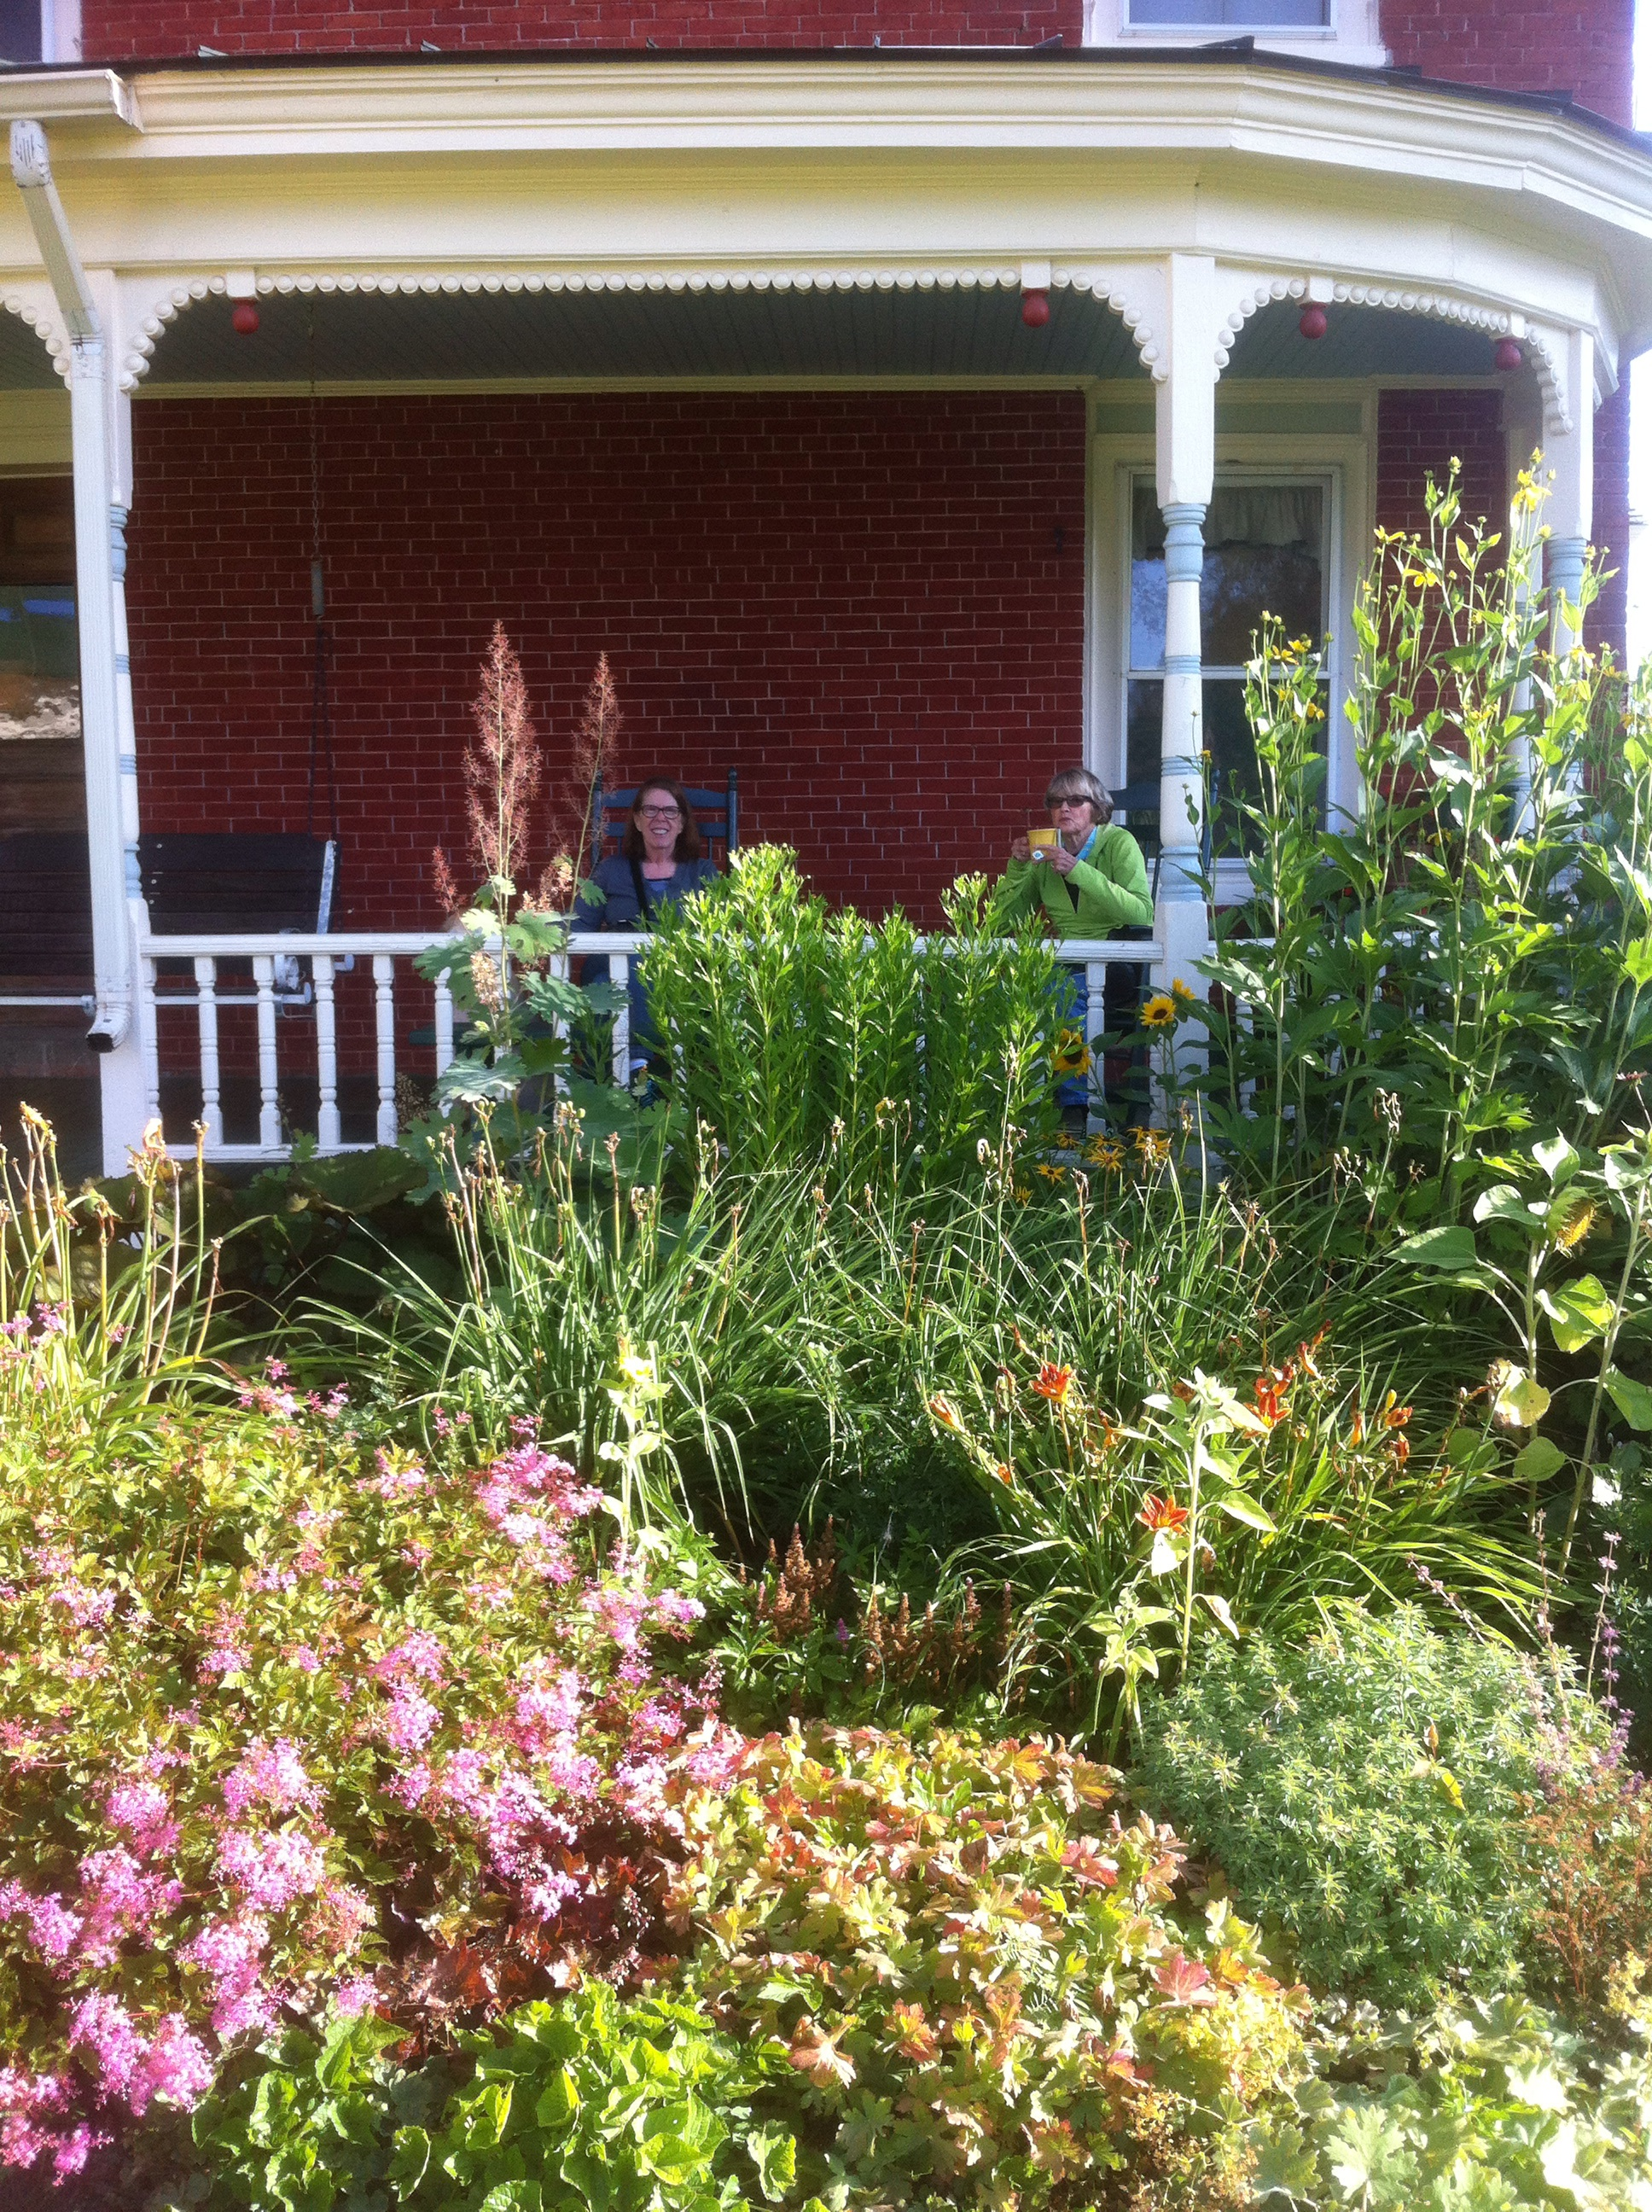 Farm women on porch